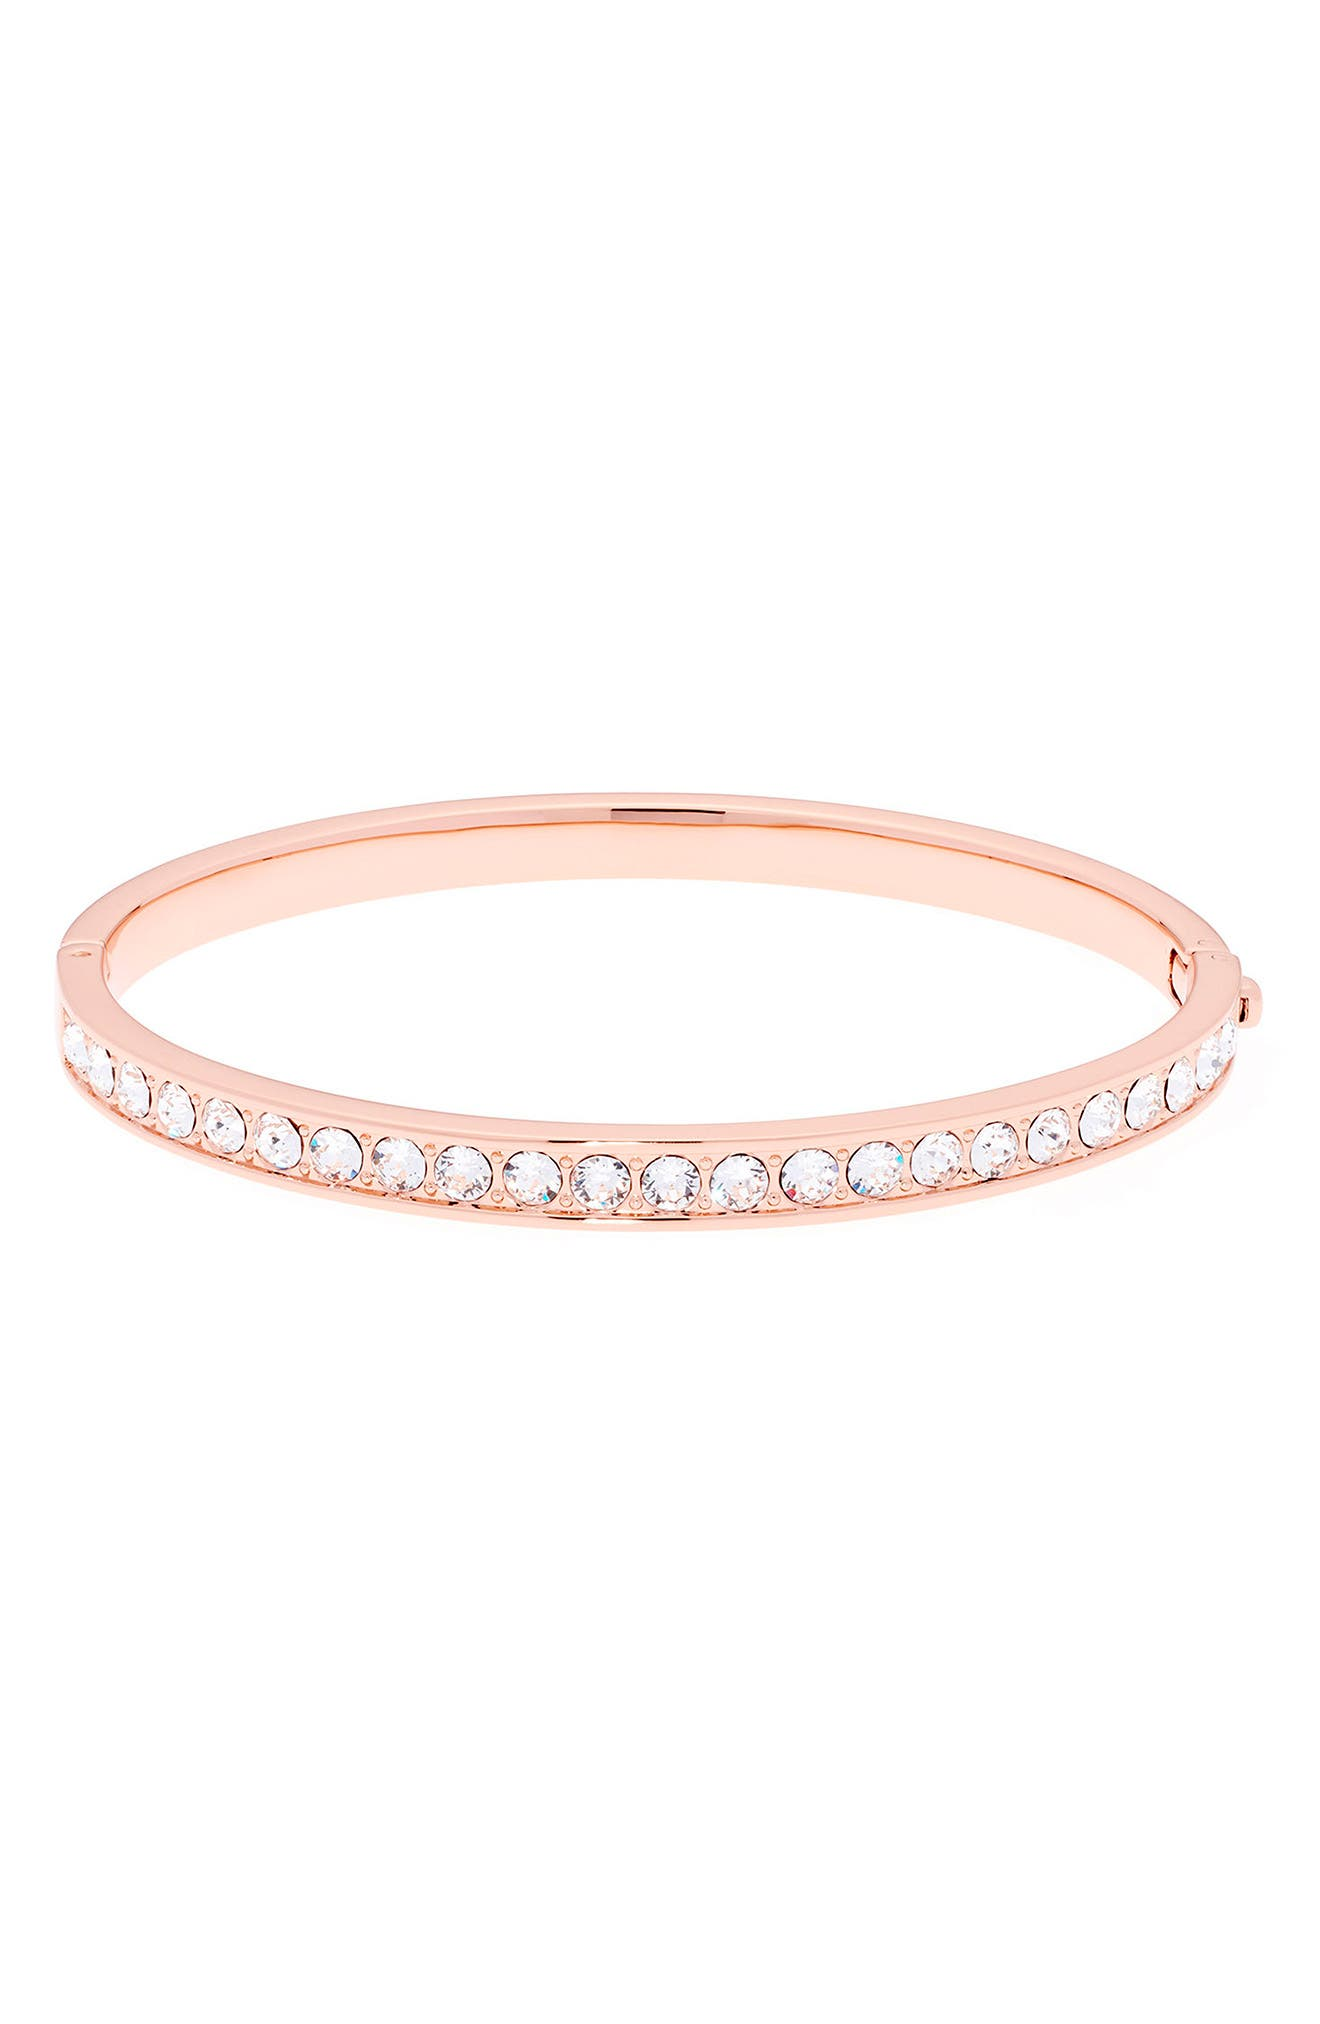 Clemara Hinge Bangle Bracelet,                         Main,                         color, Crystal